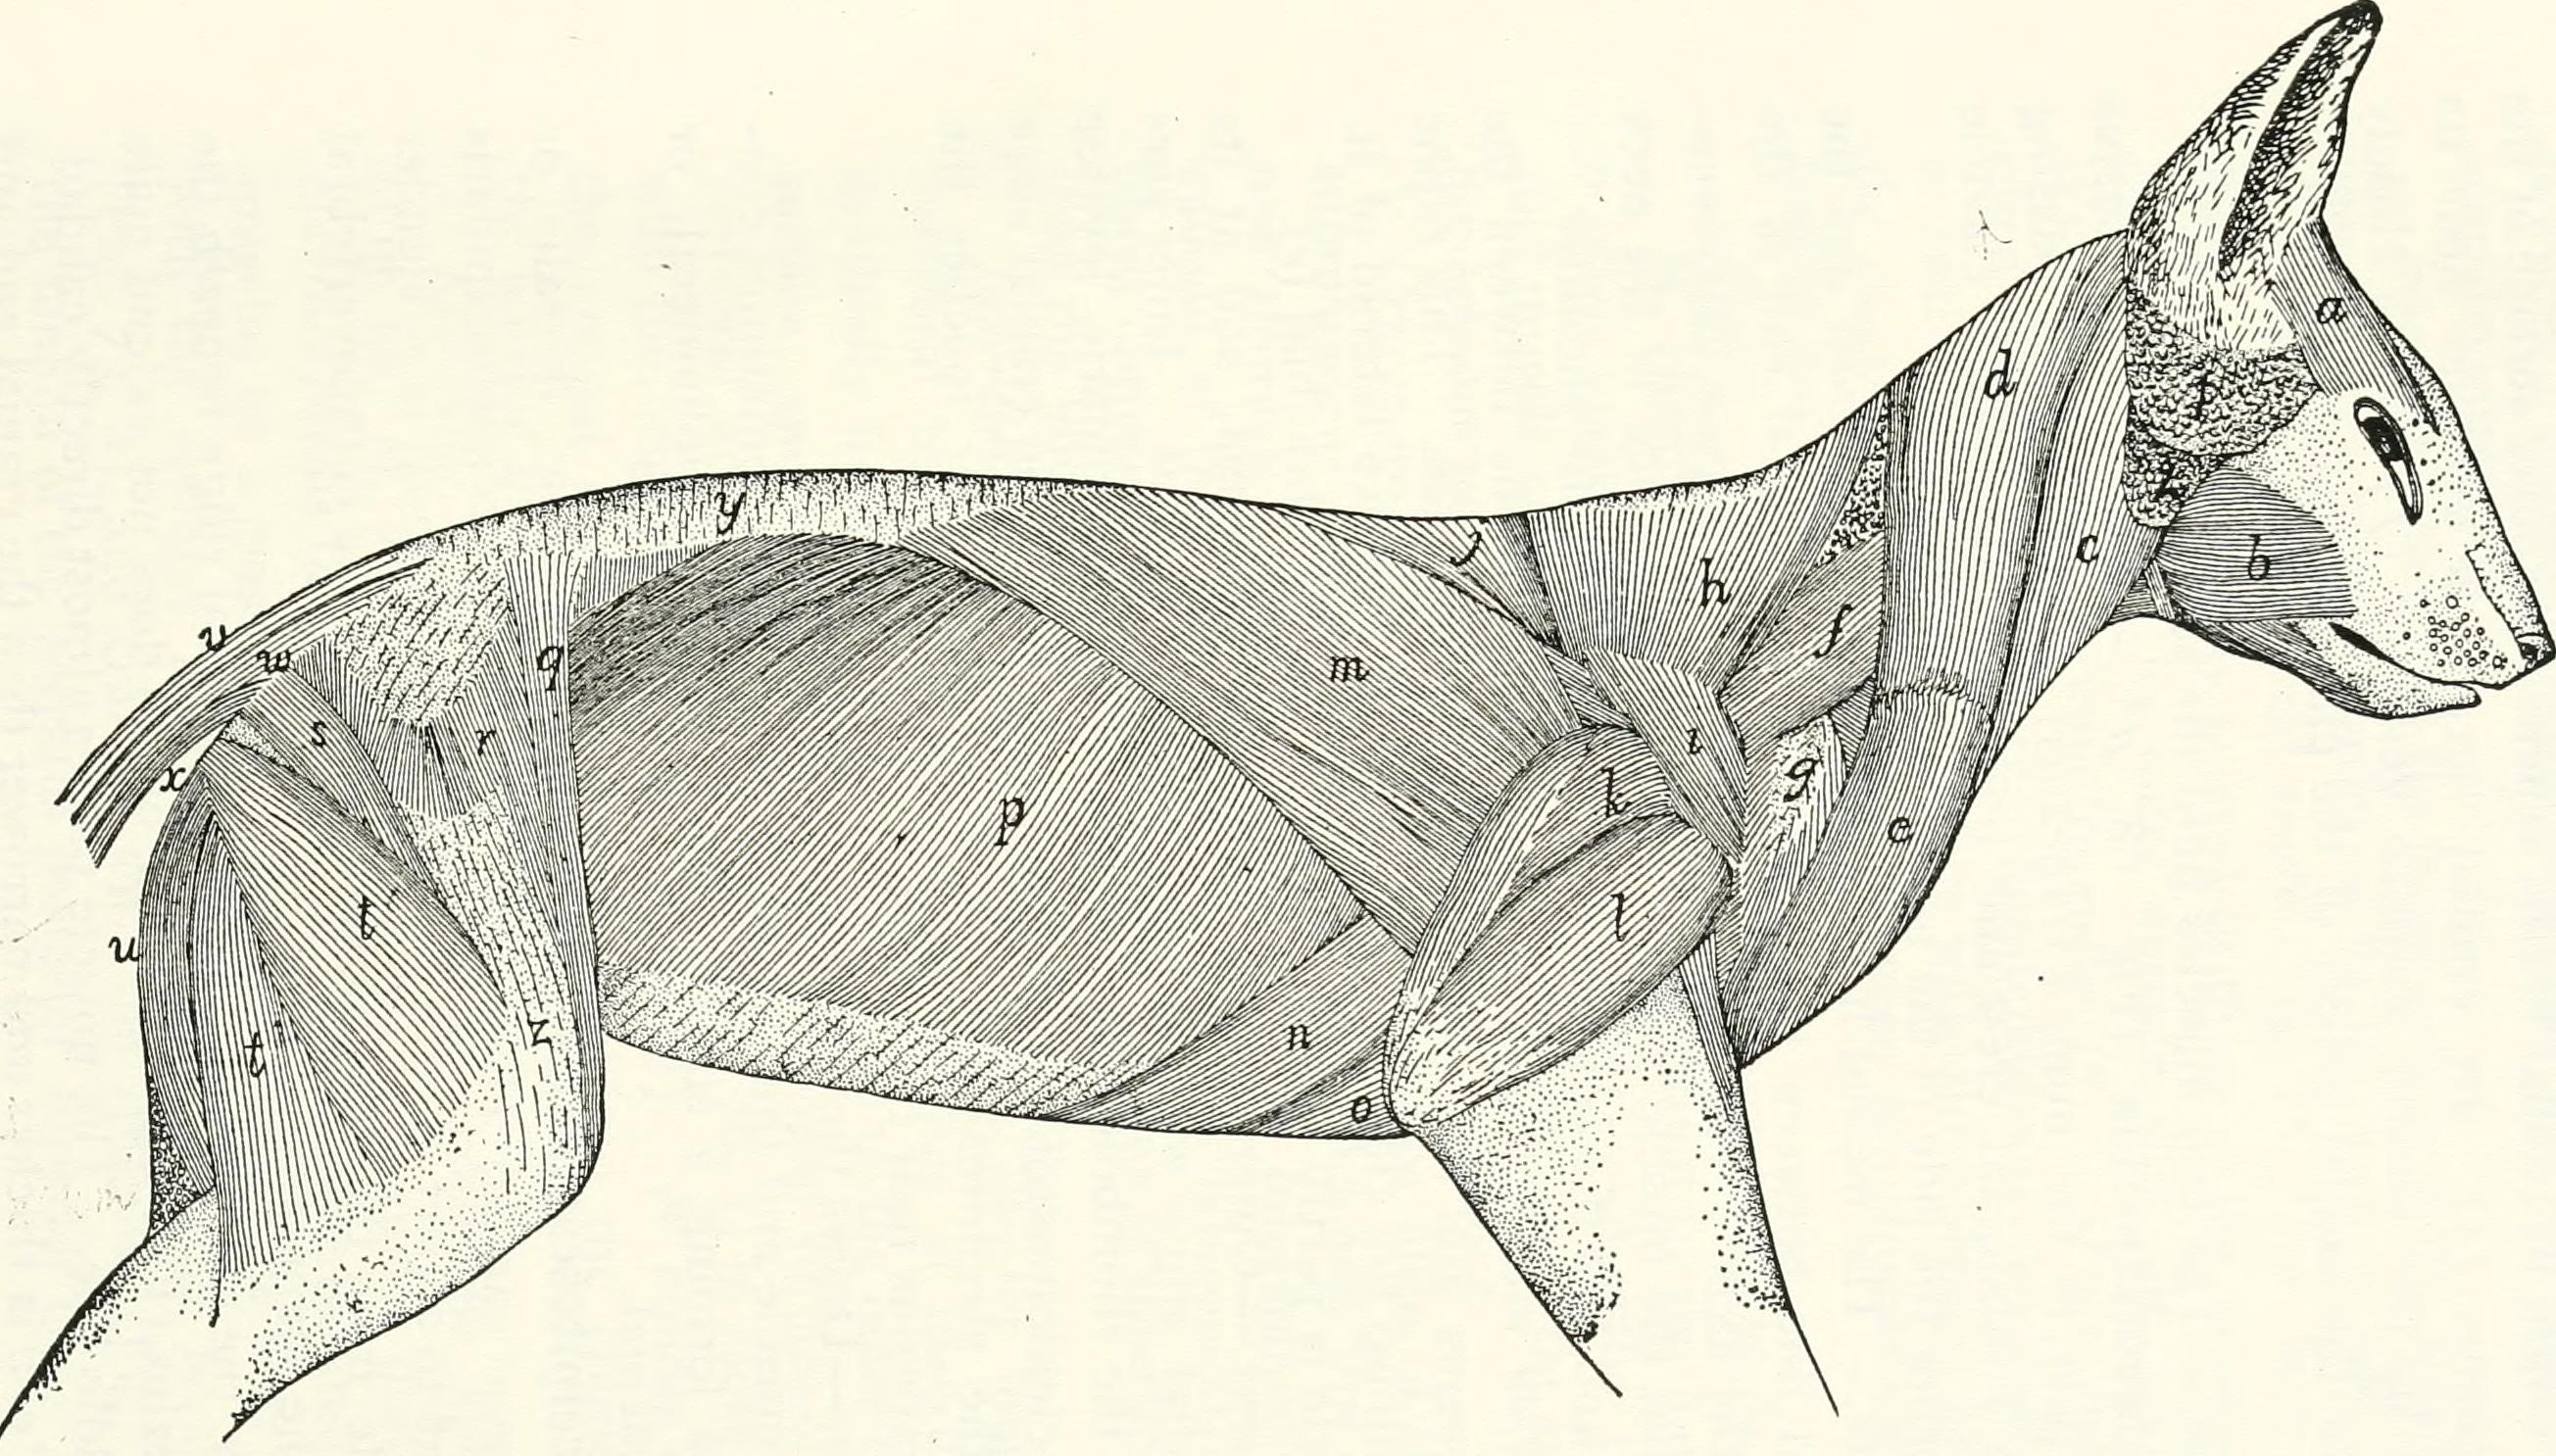 File:Anatomy of the cat (1991) (18167568546).jpg - Wikimedia Commons